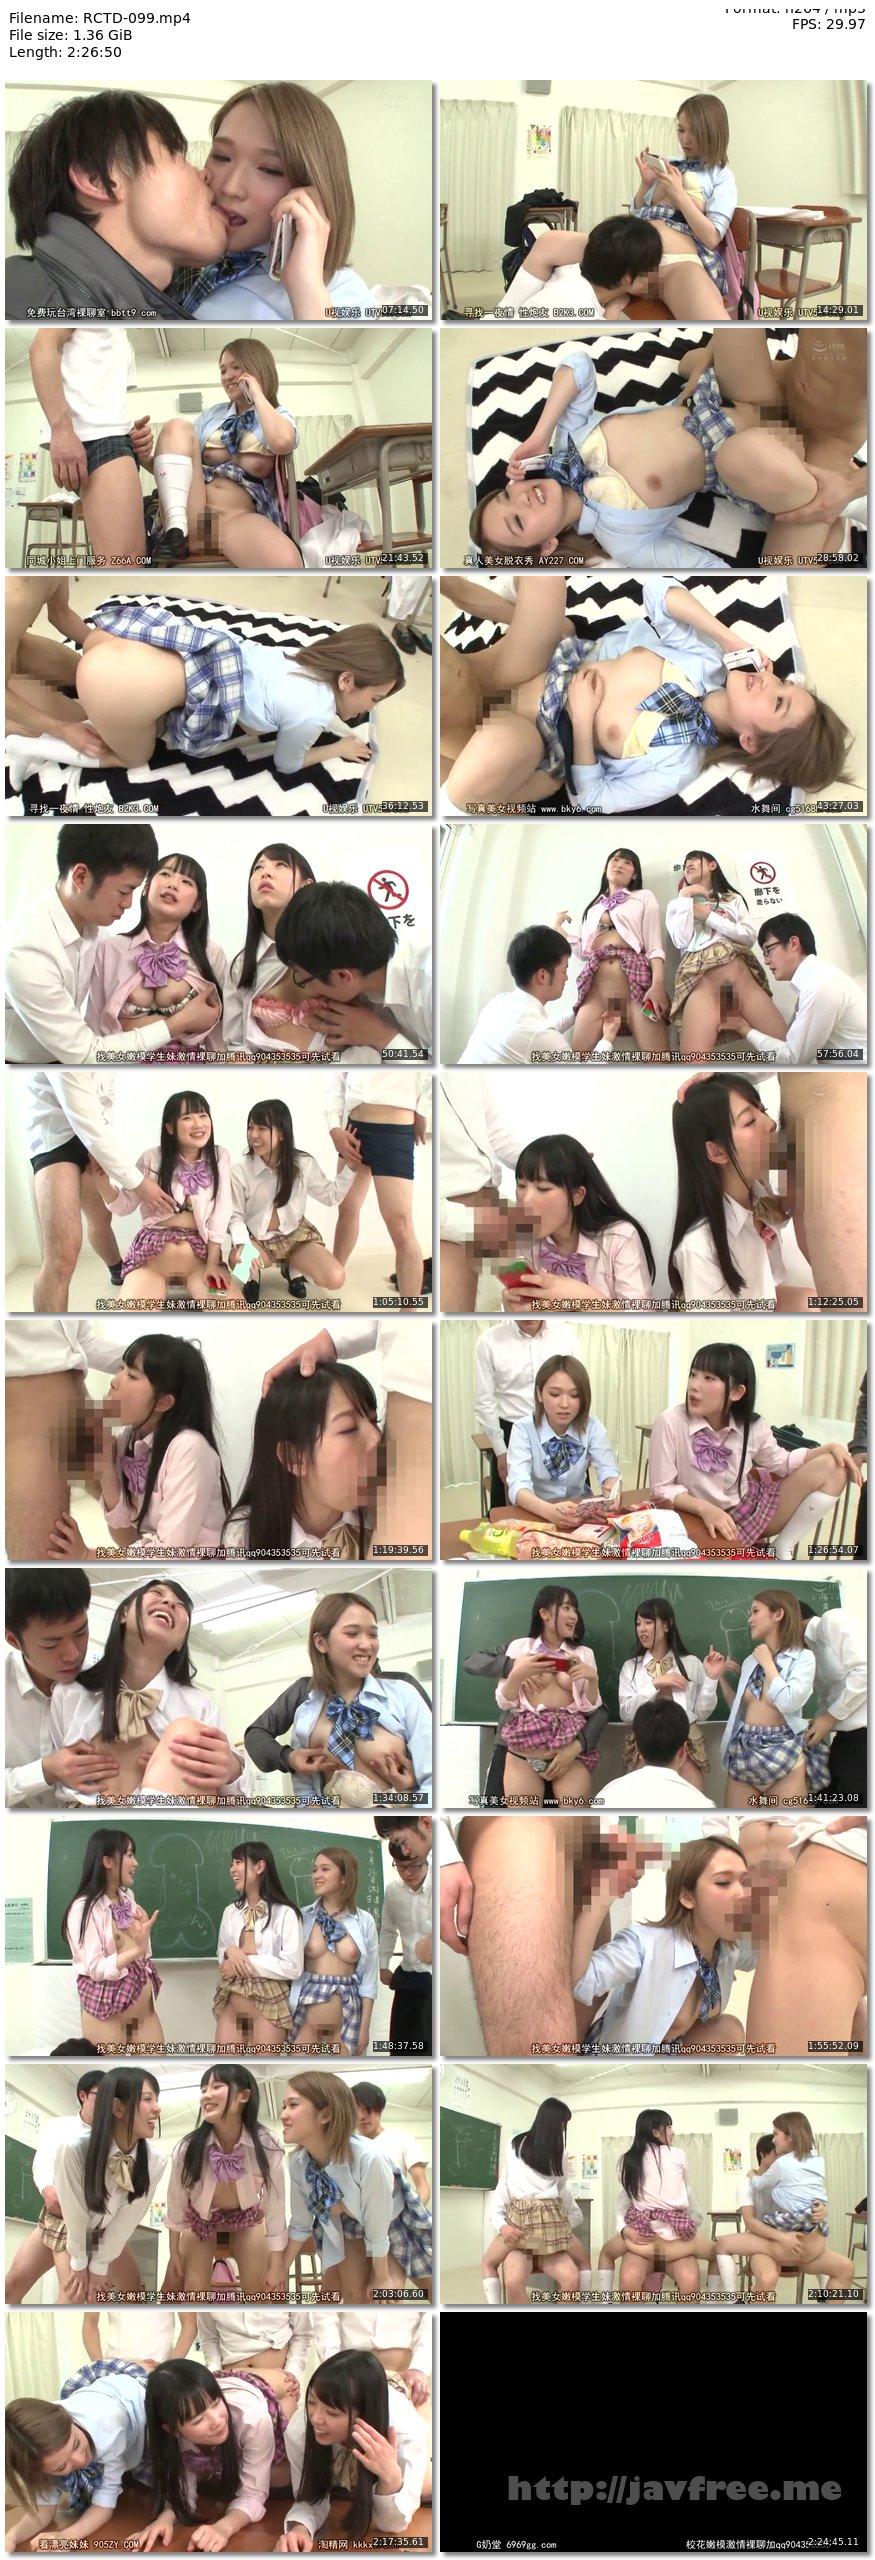 [RCTD-099] ヤリマンビッチ平然女学園 3